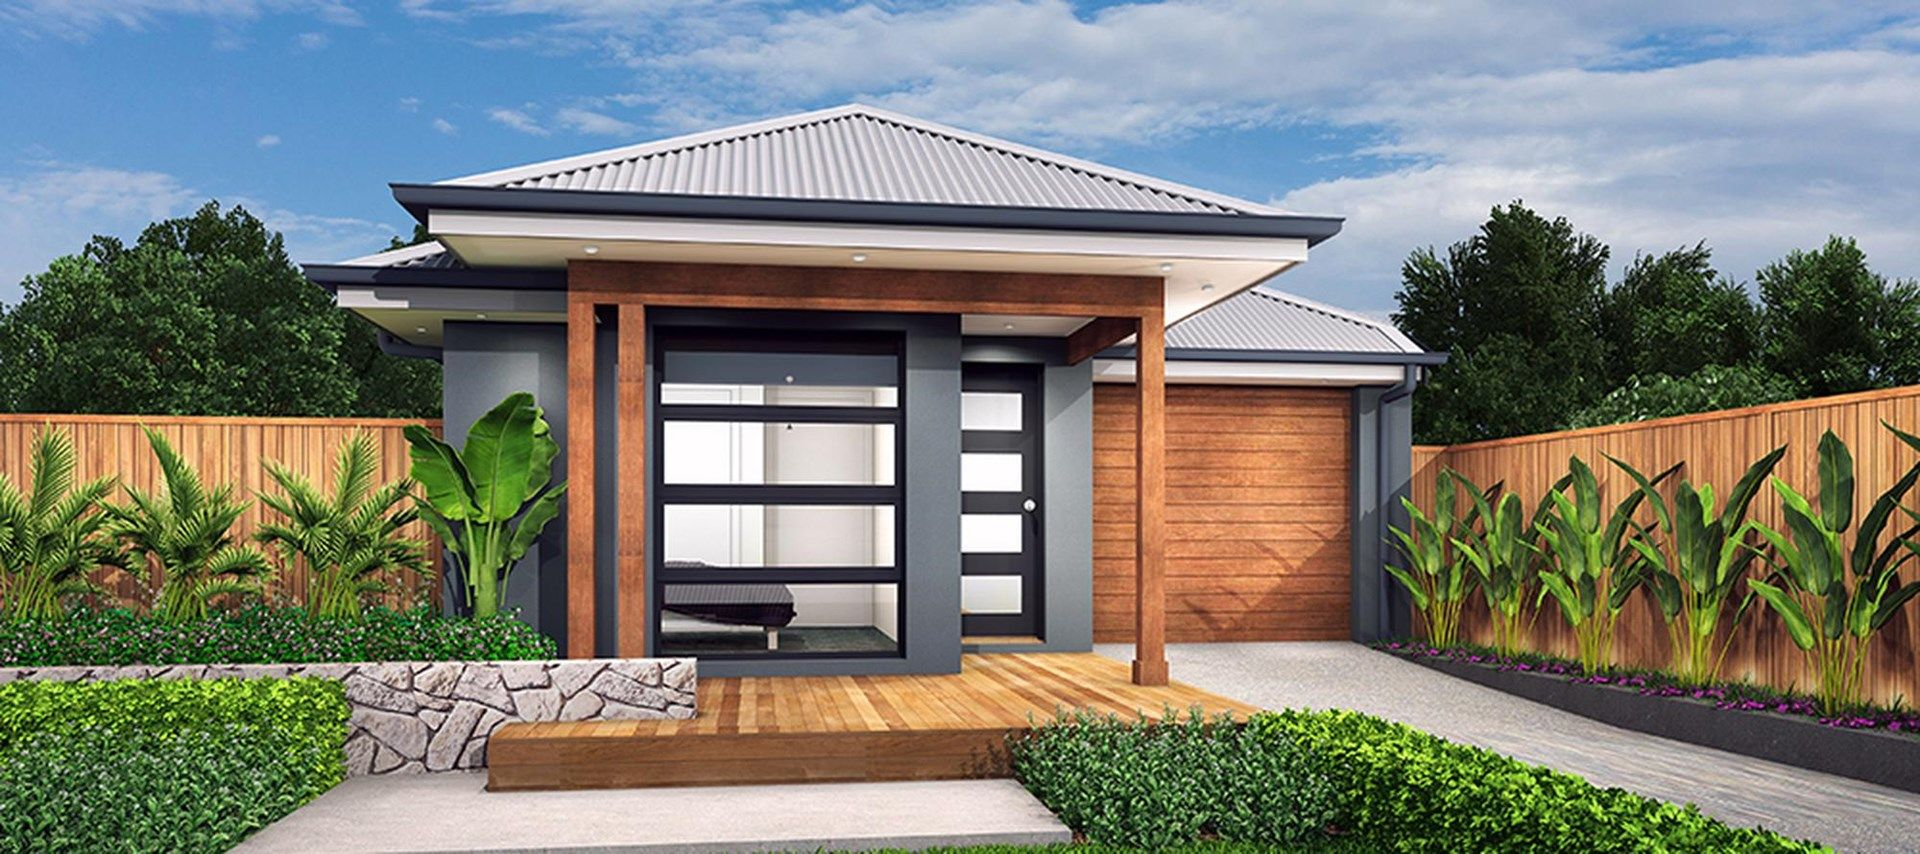 111 Kewba Street, Riverstone NSW 2765, Image 0